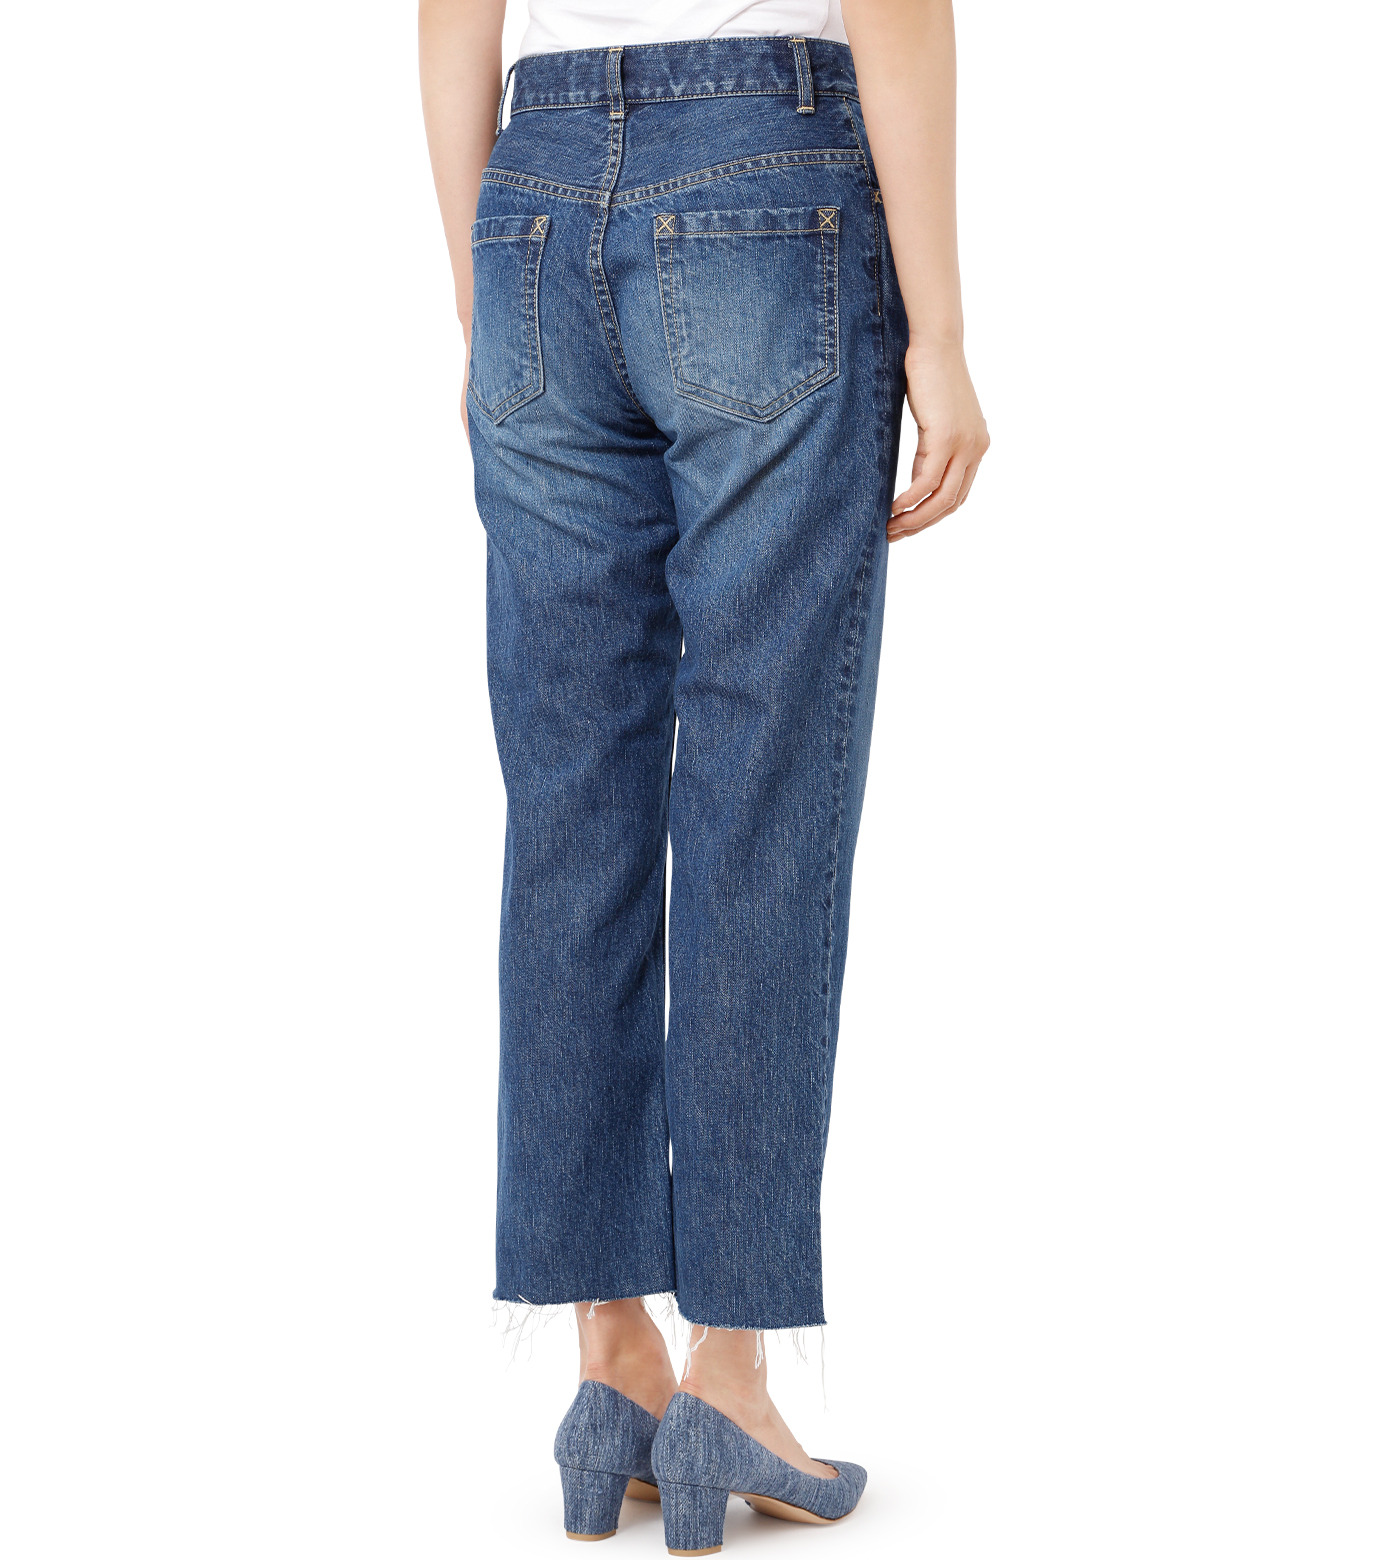 LE CIEL BLEU(ルシェルブルー)のストレートデニムパンツ-INDIGO(パンツ/pants)-18A68202 拡大詳細画像2